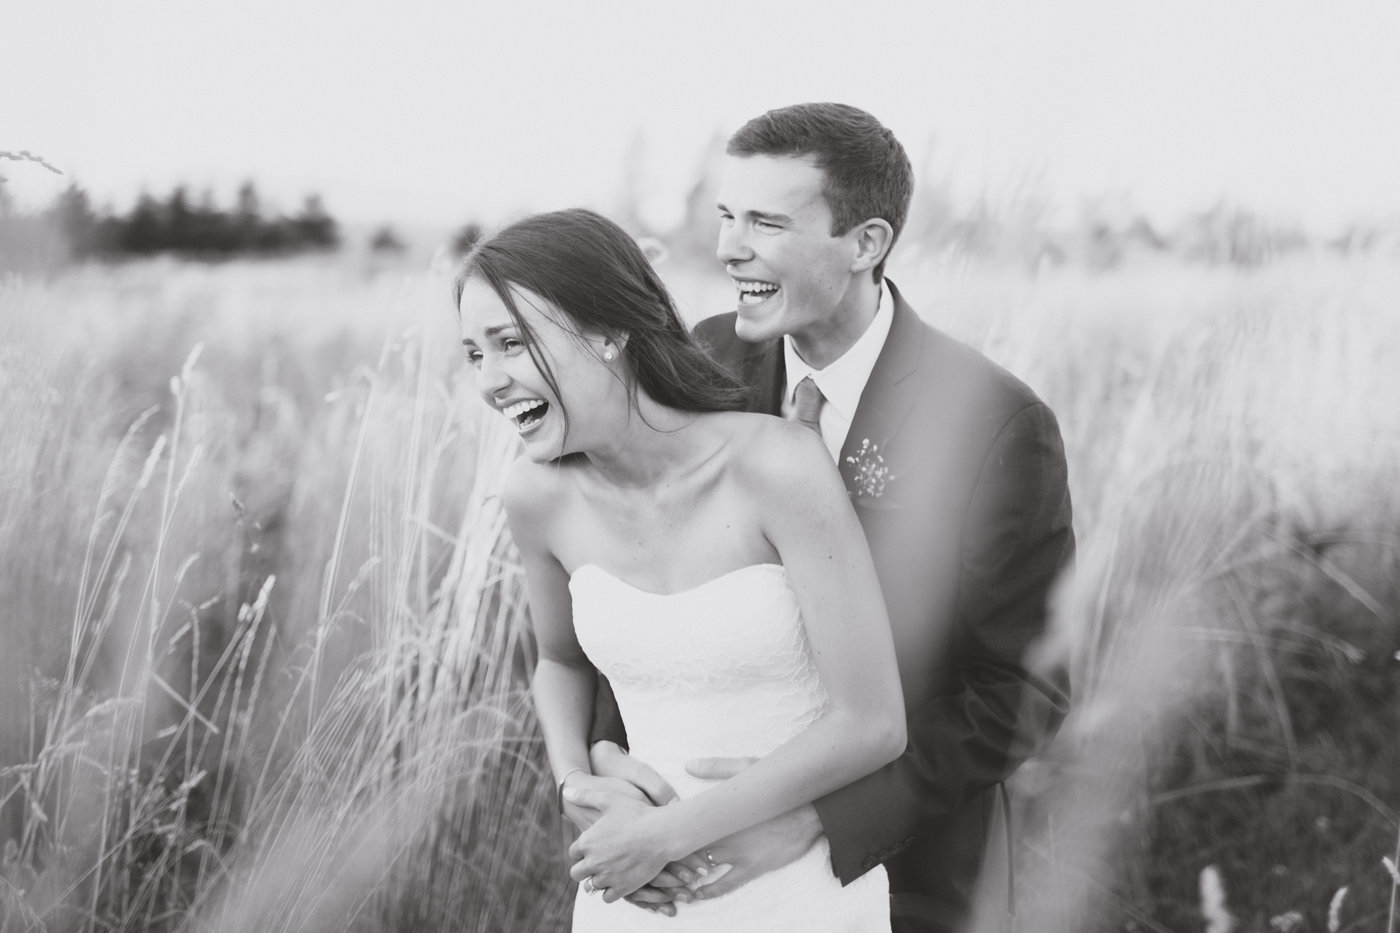 Jon and Kalina-Jon and Kalina Wedding-0423.jpg